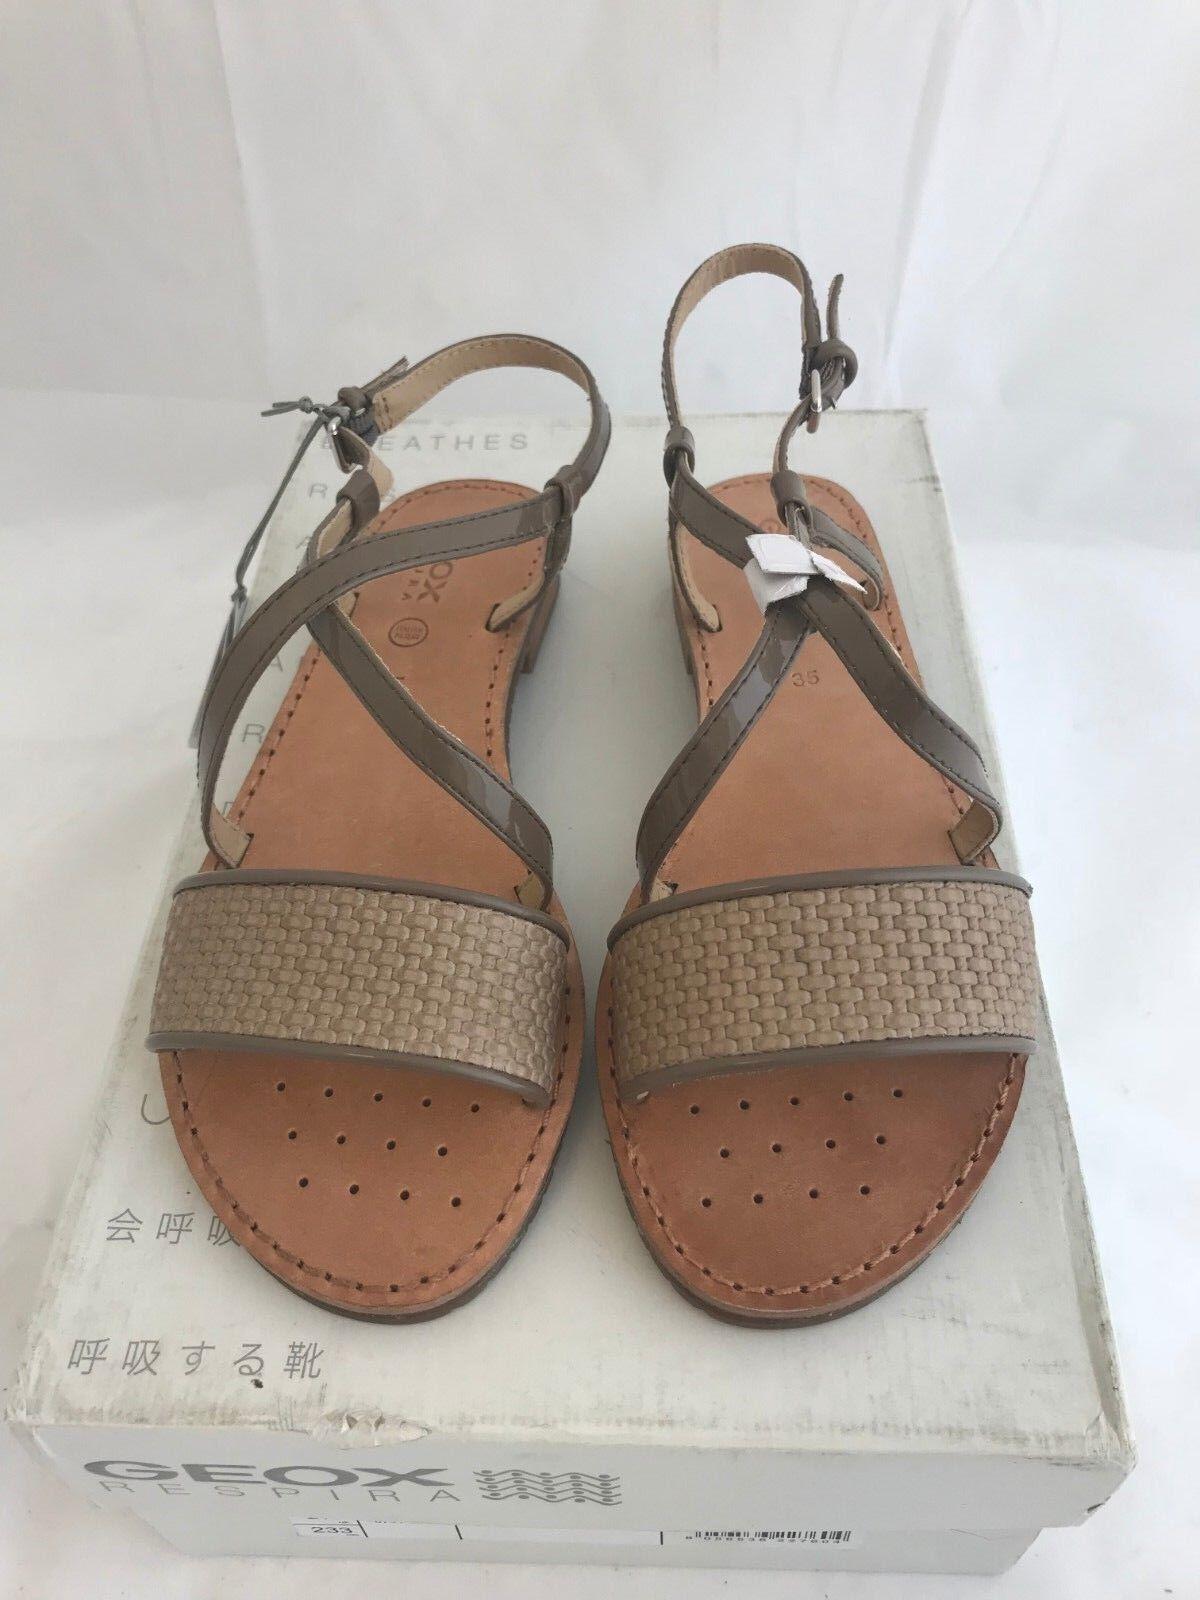 Geox D Jolanda 7 Womens Toe Ring Sandal Taupe Size 5US 35EU